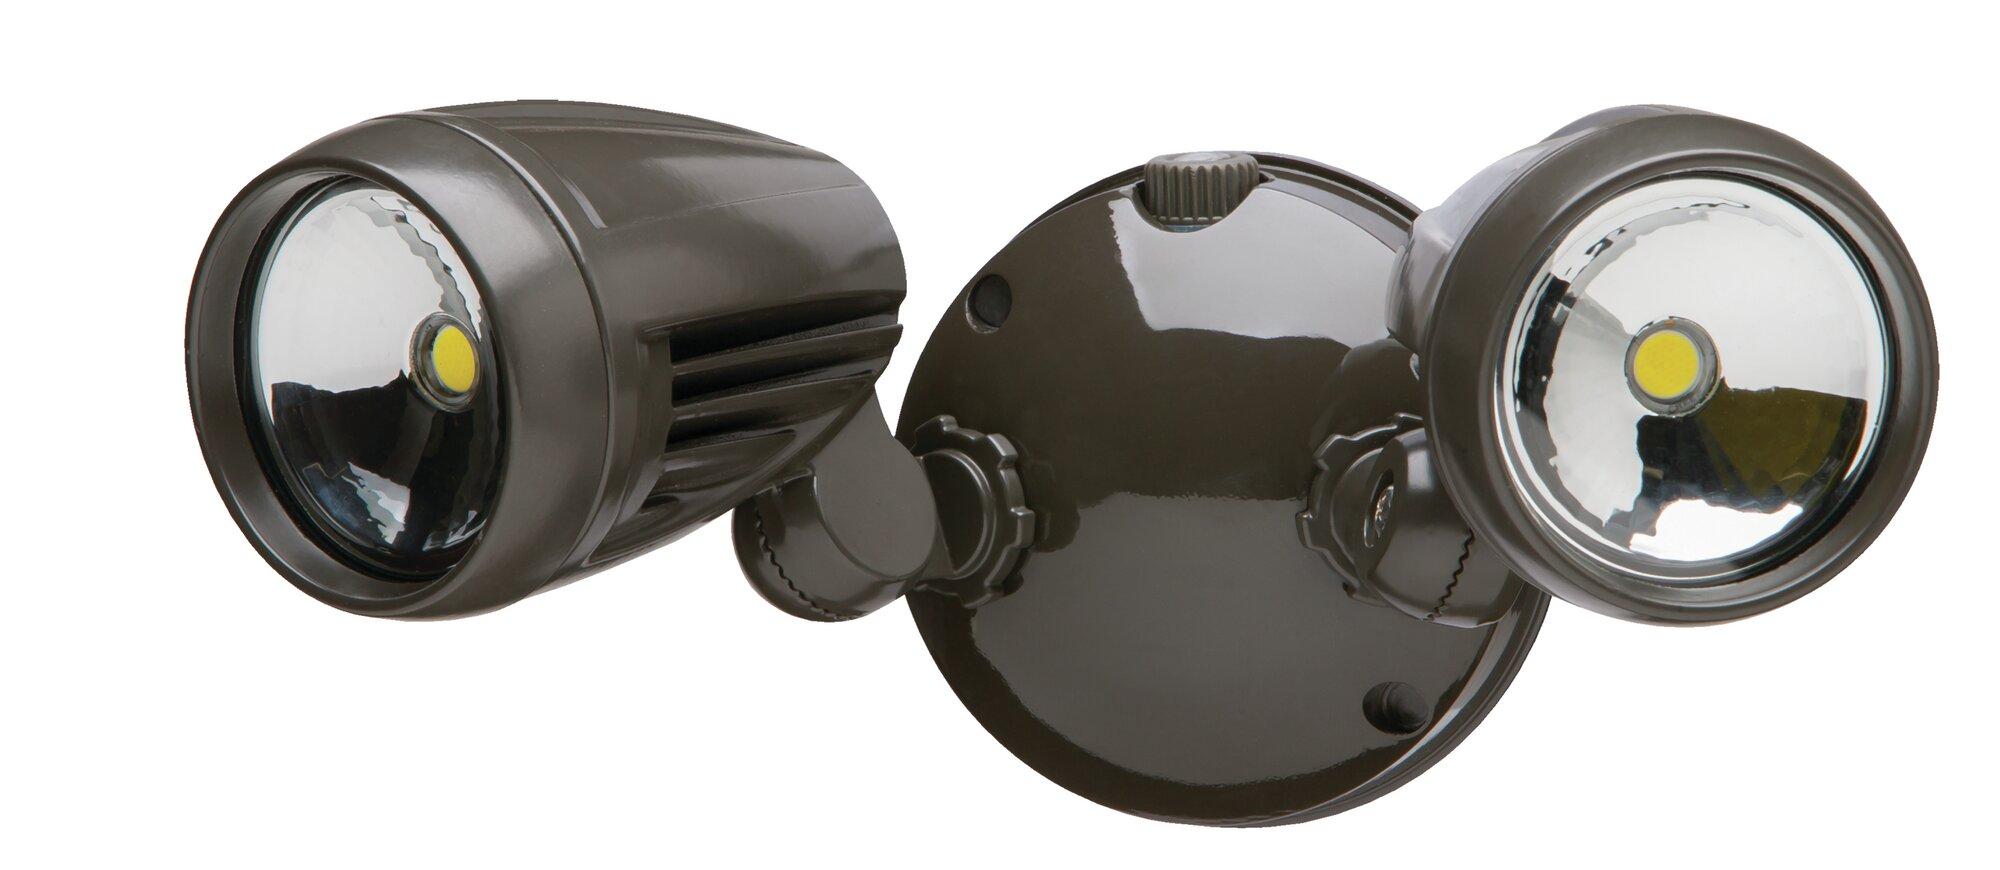 about heath zenith dual head led automatic dusk to dawn flood light. Black Bedroom Furniture Sets. Home Design Ideas